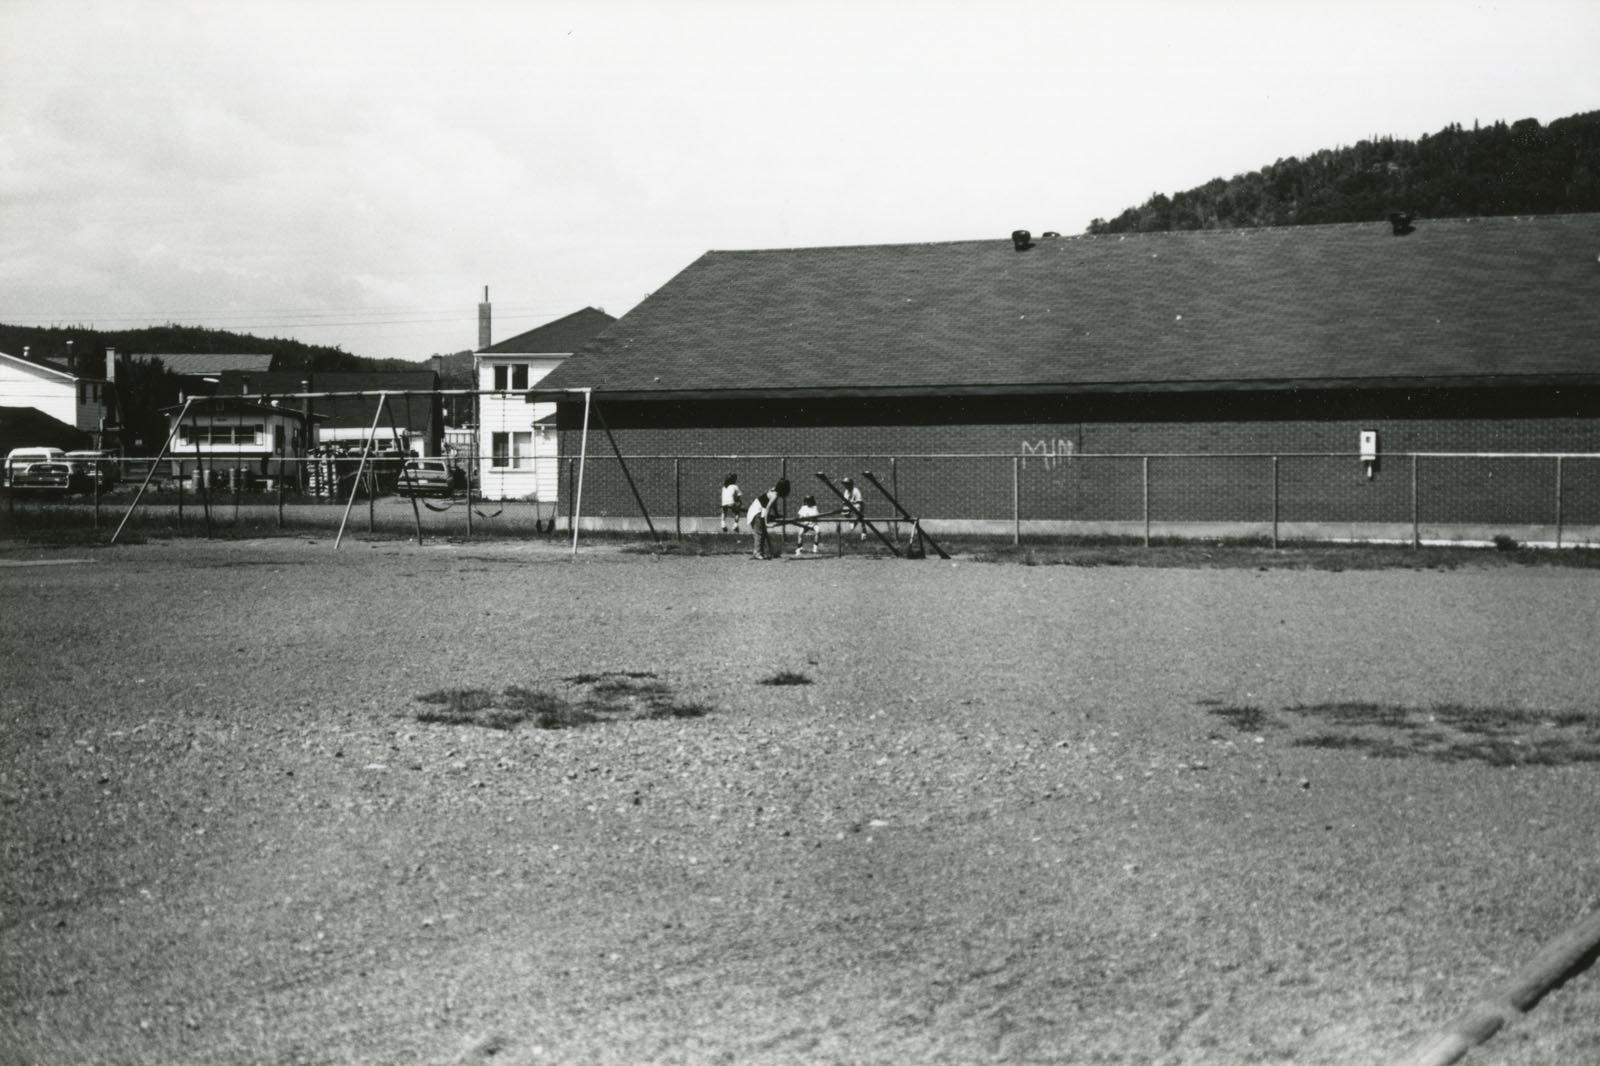 Public School Playground